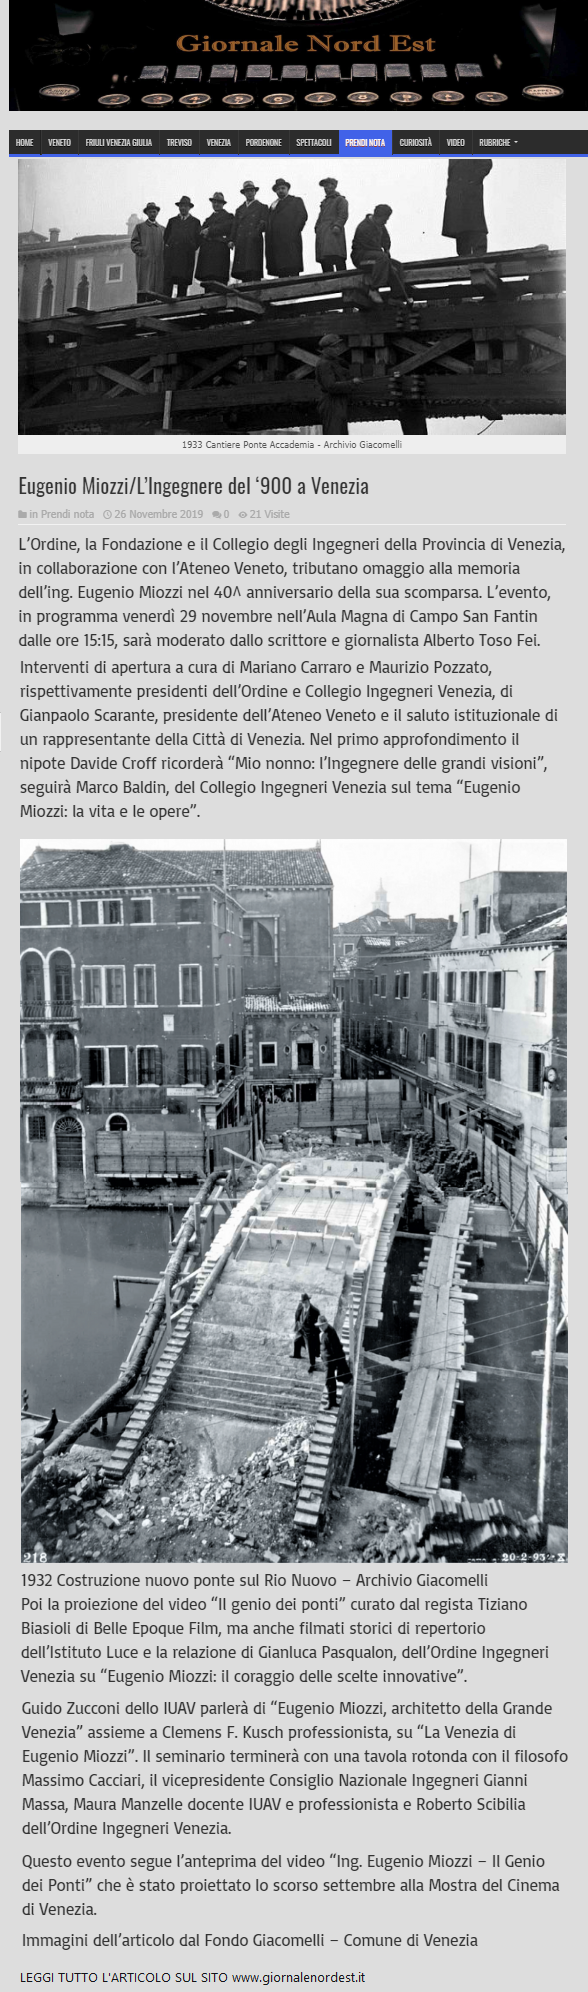 26.11.2019 - giornale nord est - seminario ing. eugenio miozzi - evento ingegneri venezia.png